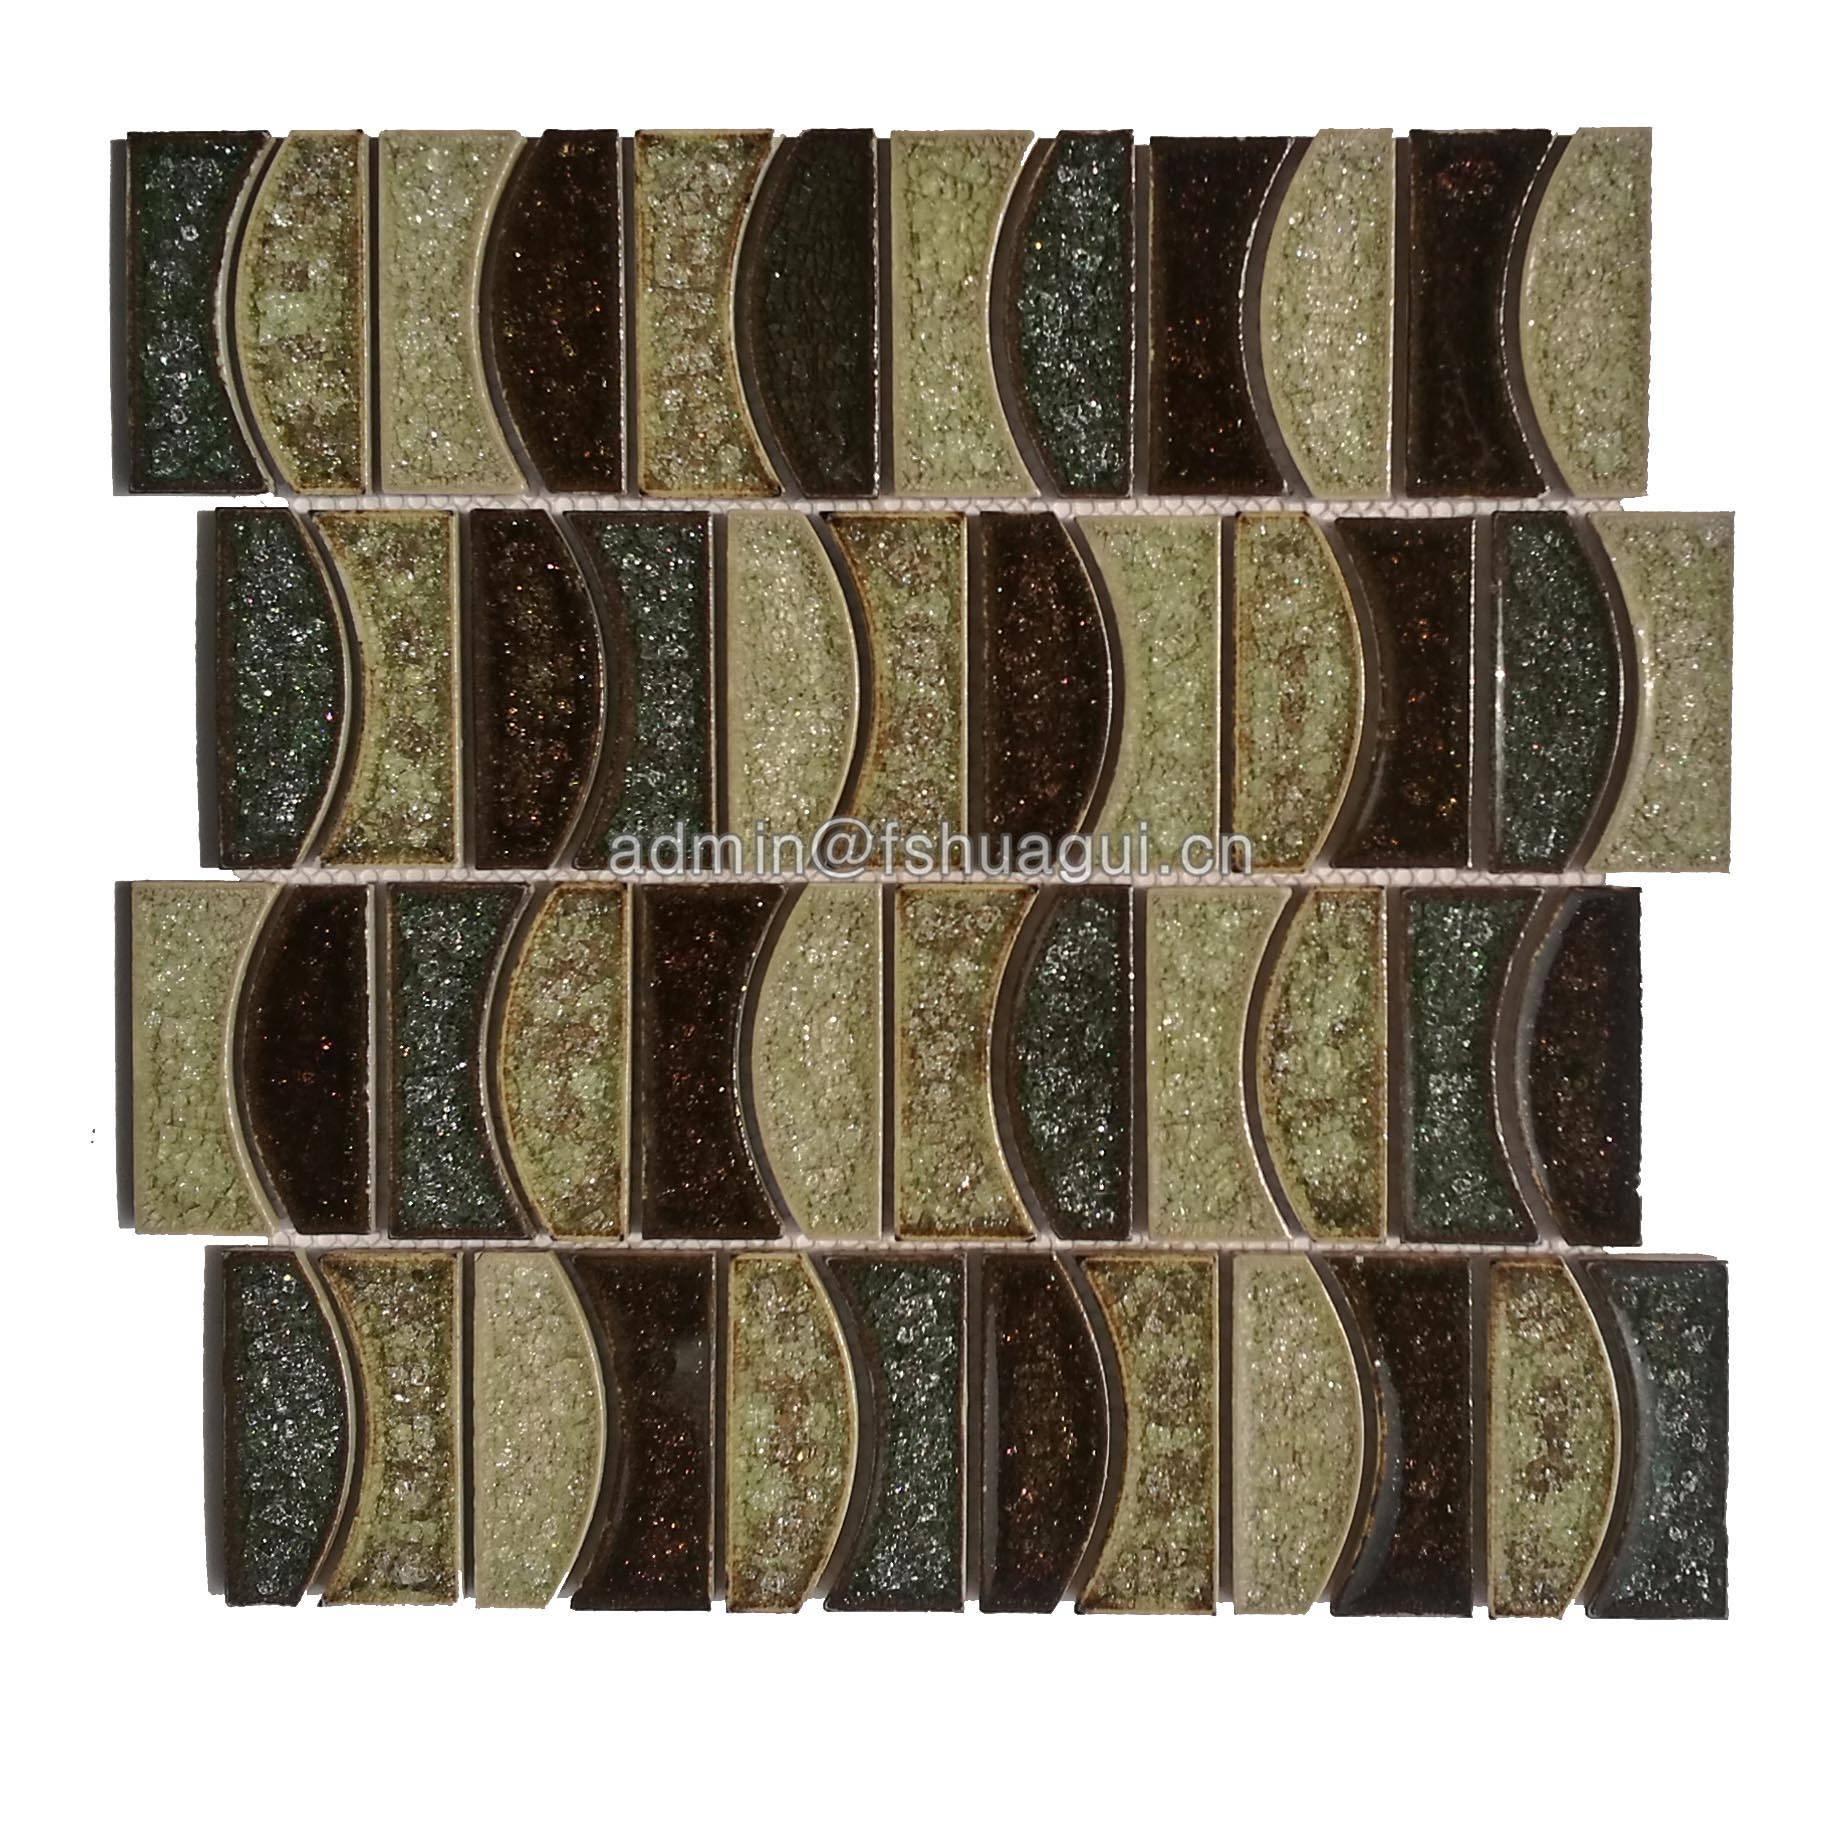 Huagui Ceramic Mosaic Tile HG-IC011 CERAMIC MOSAIC TILE image4